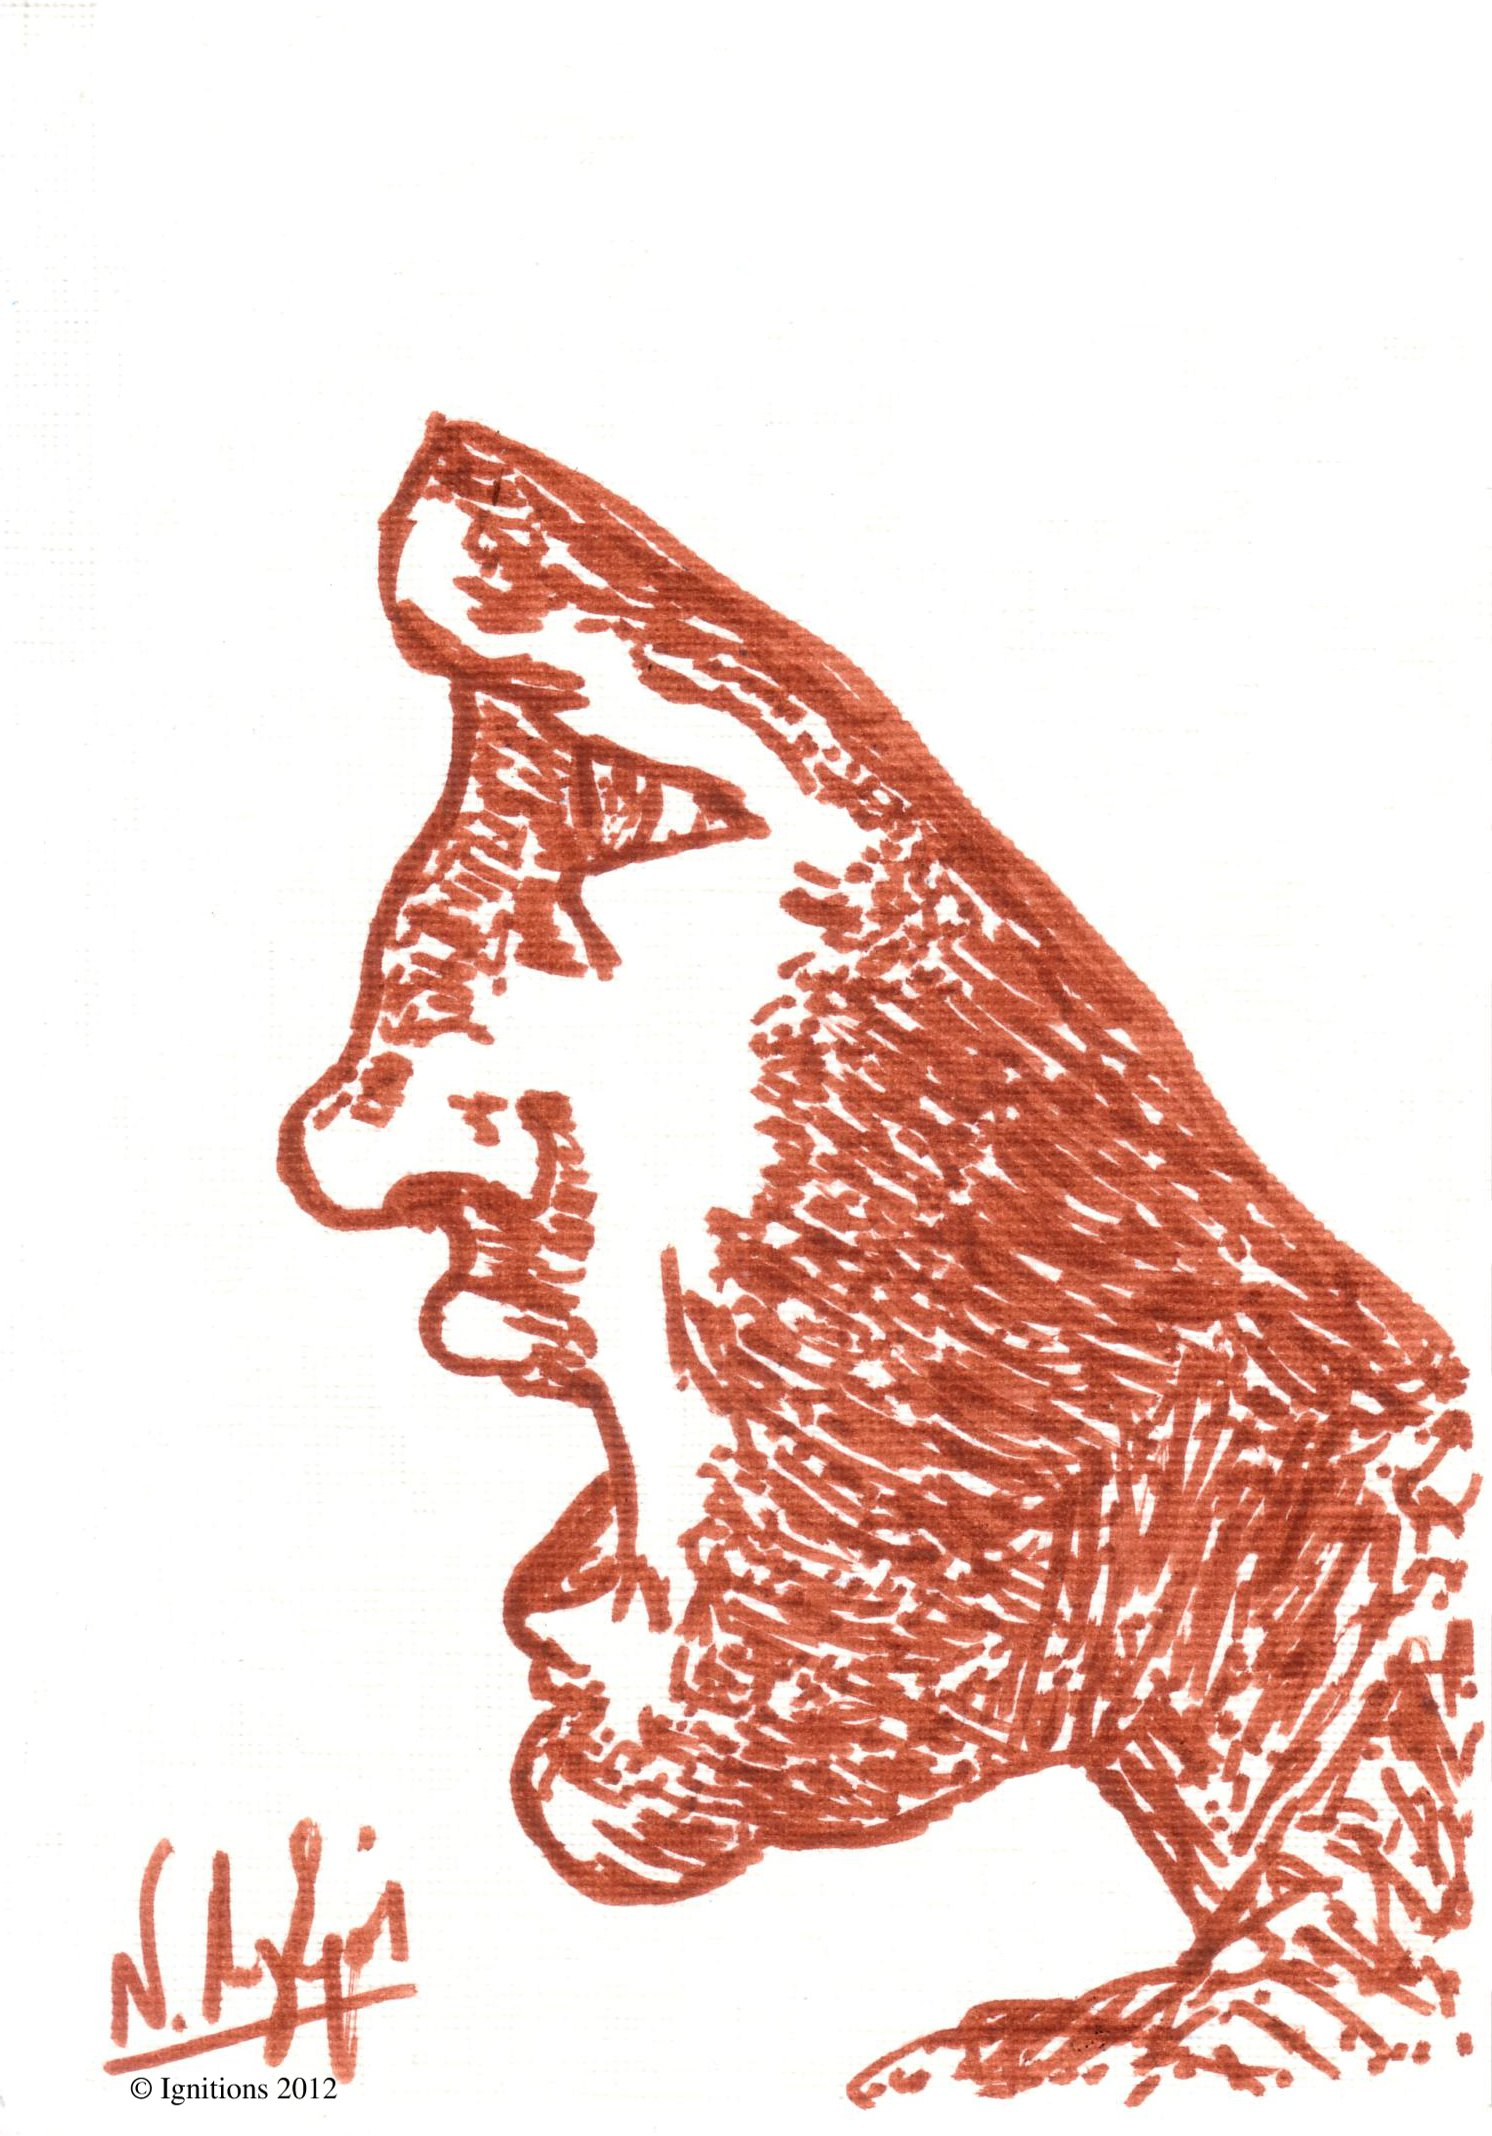 Tête de guerrier de Leonardo da Vinci.